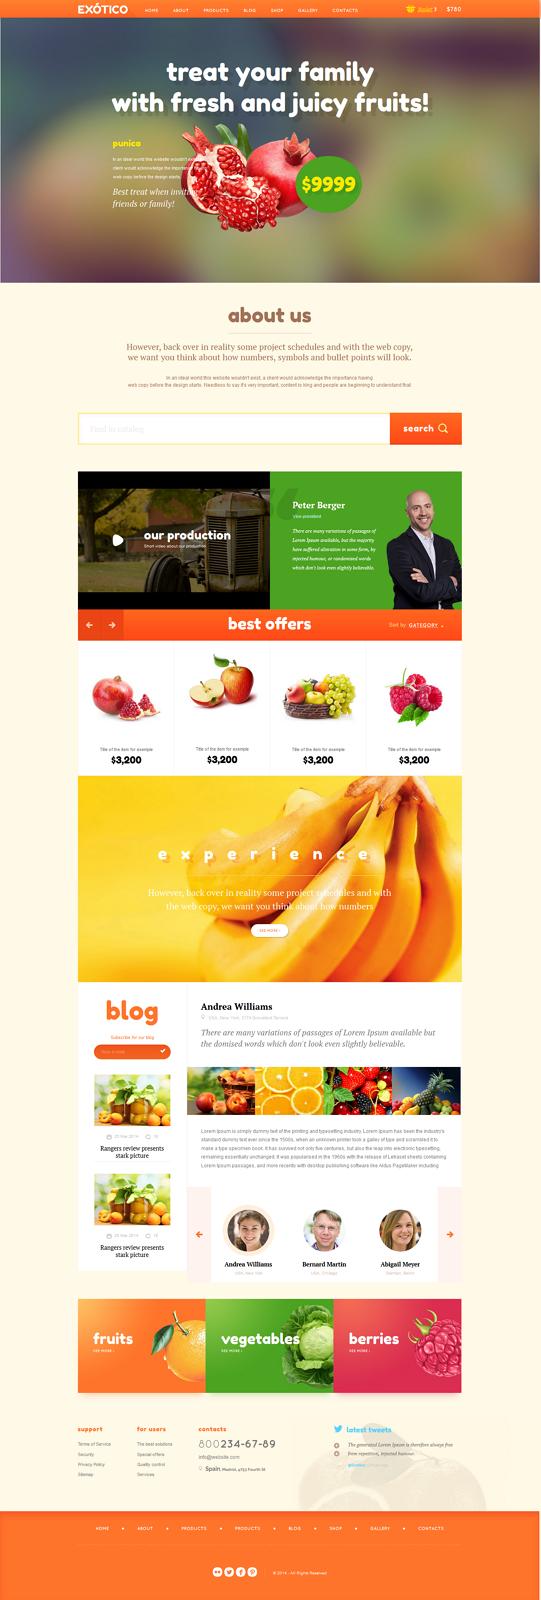 agriculture websites agriculture websites Idealvistalistco